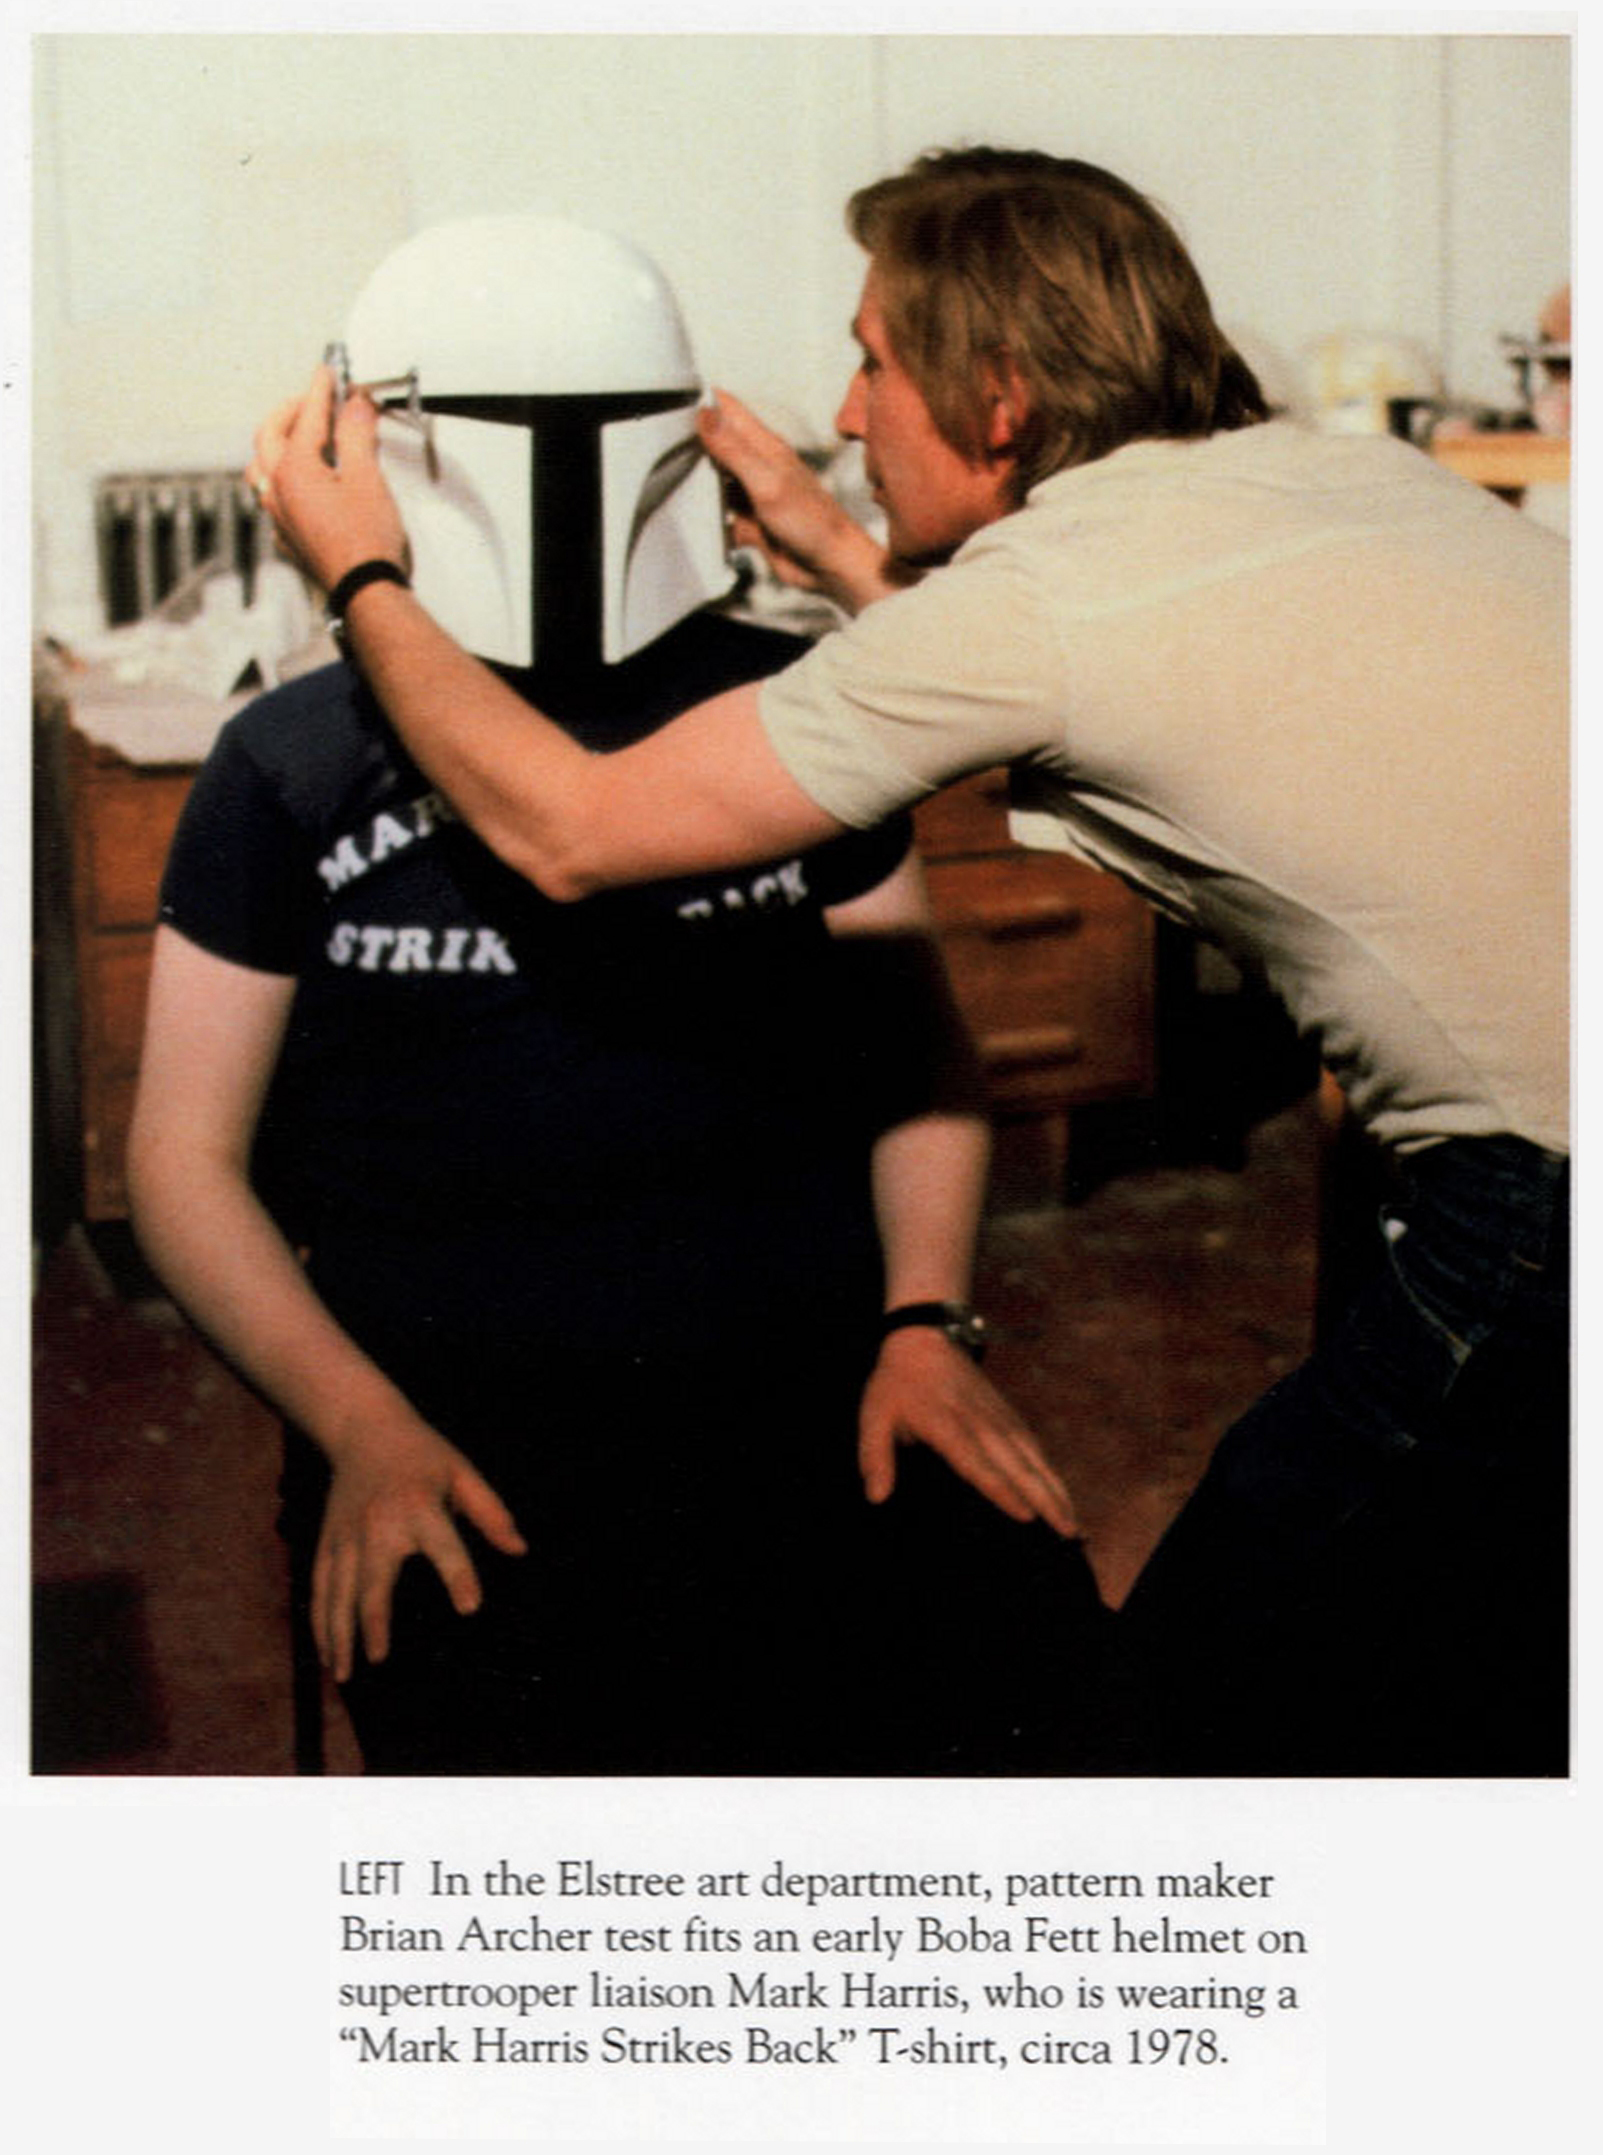 Elstree-Art-Department-Helmet-Test-Fit-Mark-Harris-1978.jpg